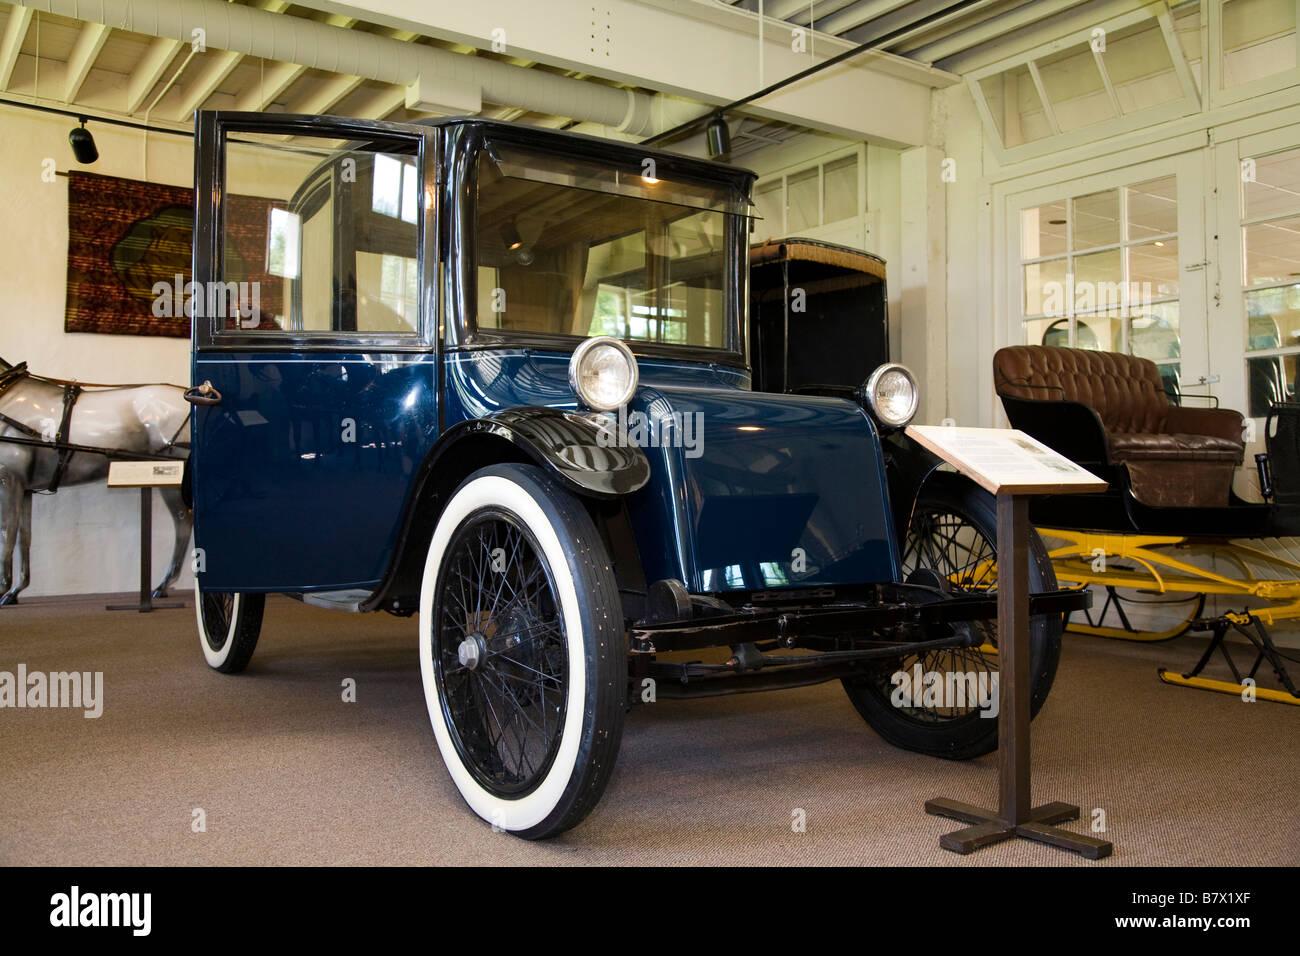 Electric Car Museum Stock Photos & Electric Car Museum Stock Images ...